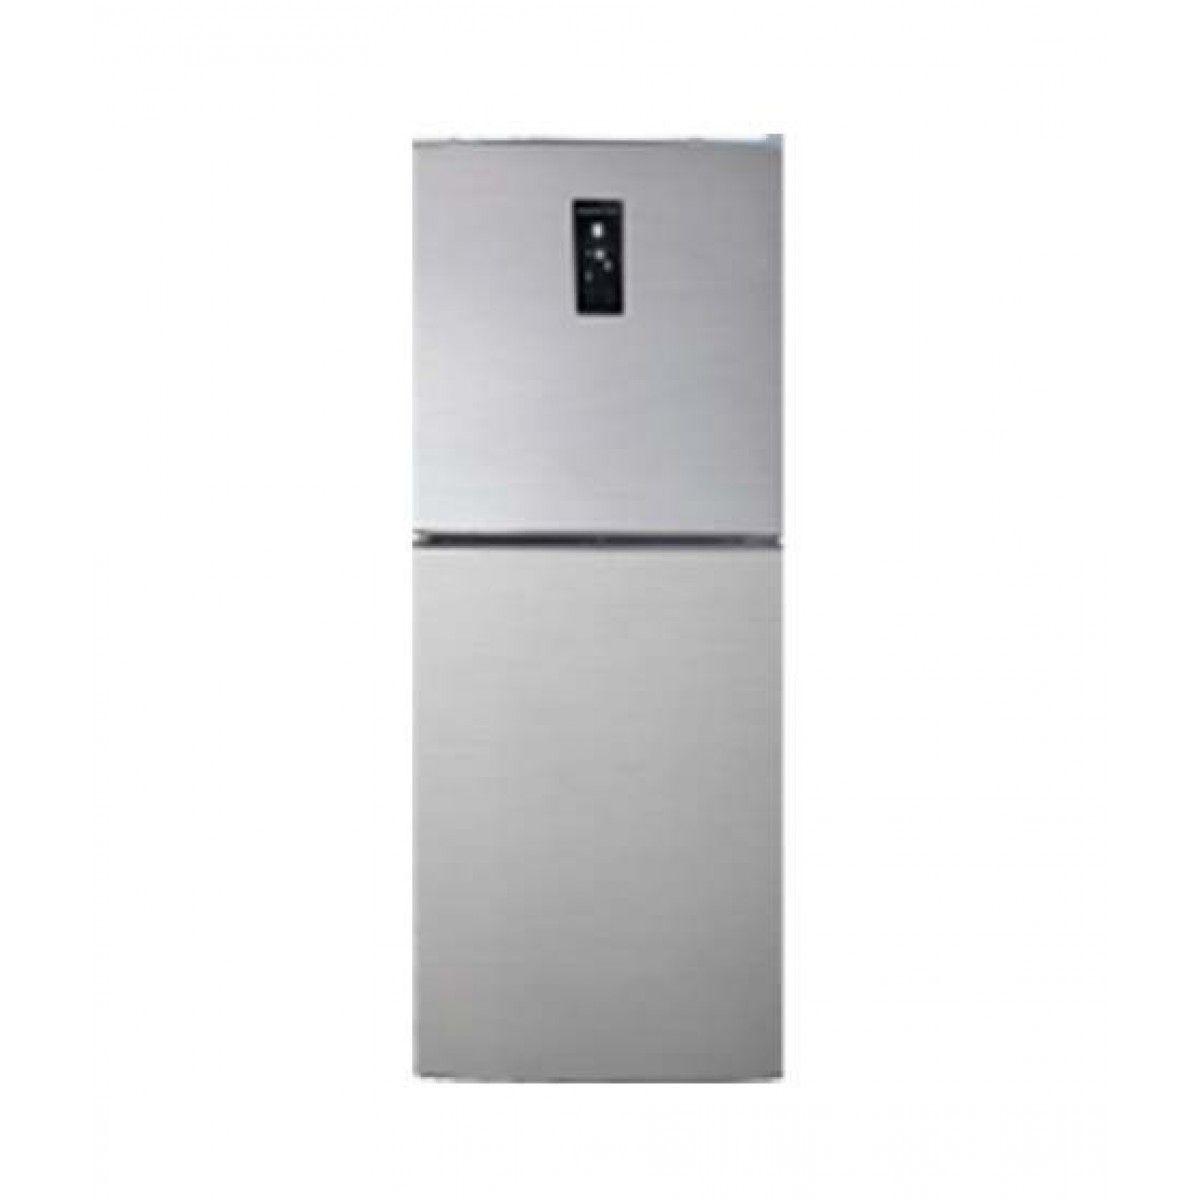 Changhong Ruba CHR-DD338SP 12 cu ft Refrigerator